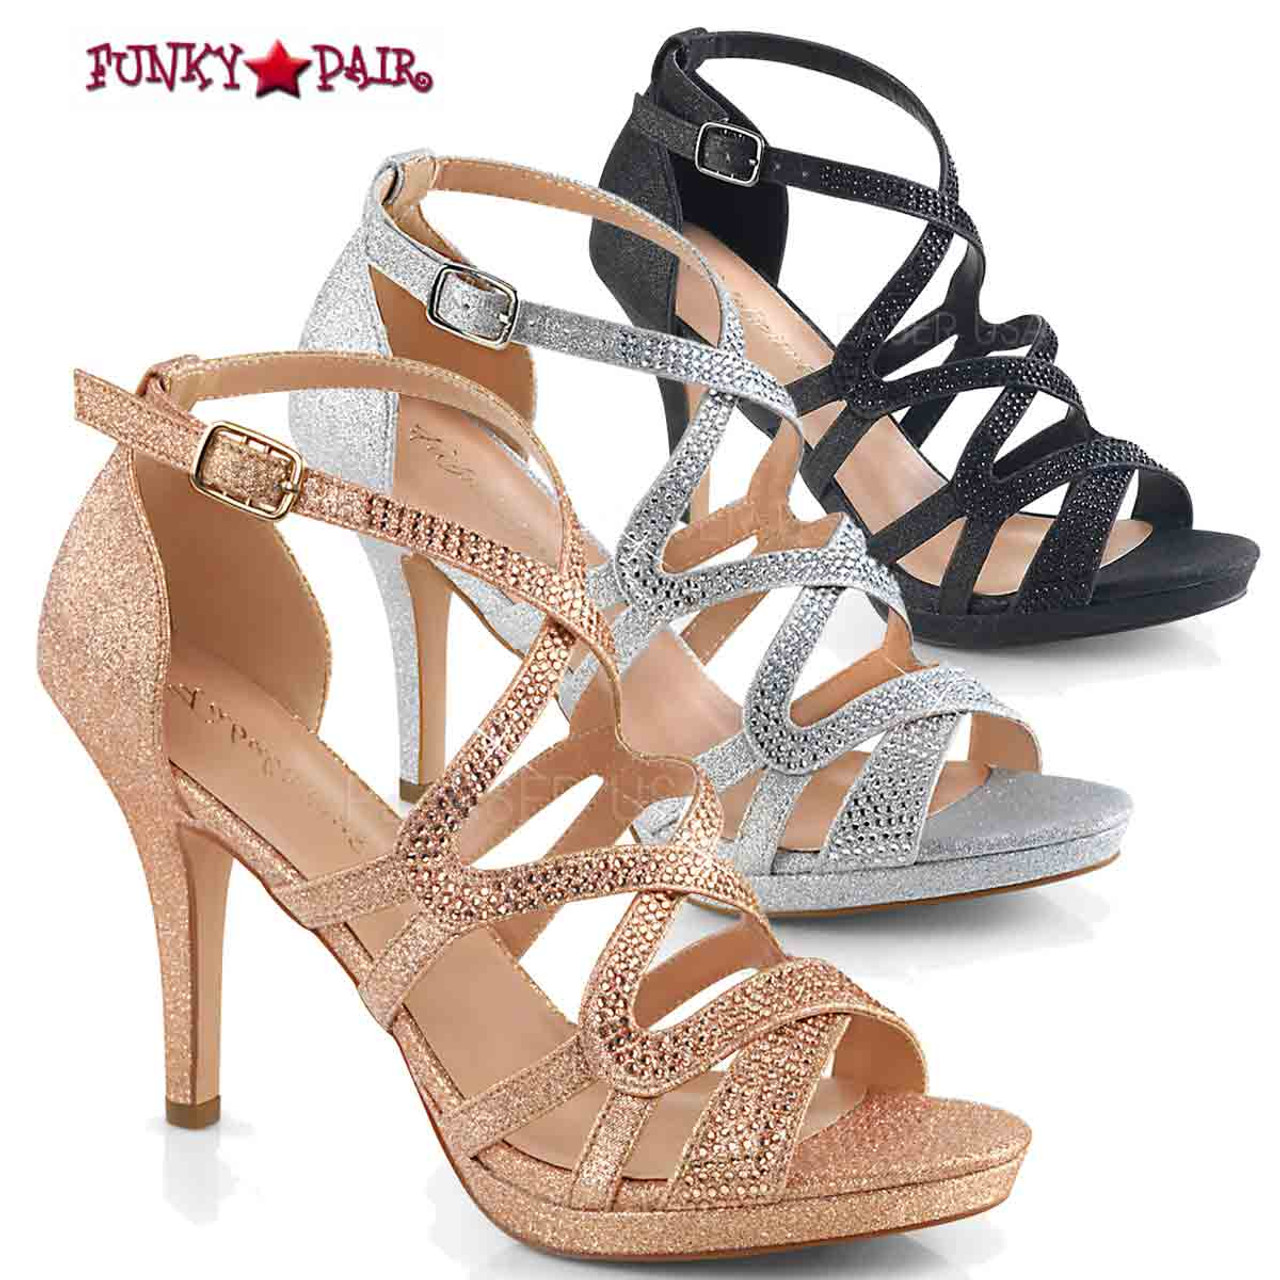 84dbae7e Daphne-42, Strappy Criss-Cross Sandal Color Available: Black, Silver and ...